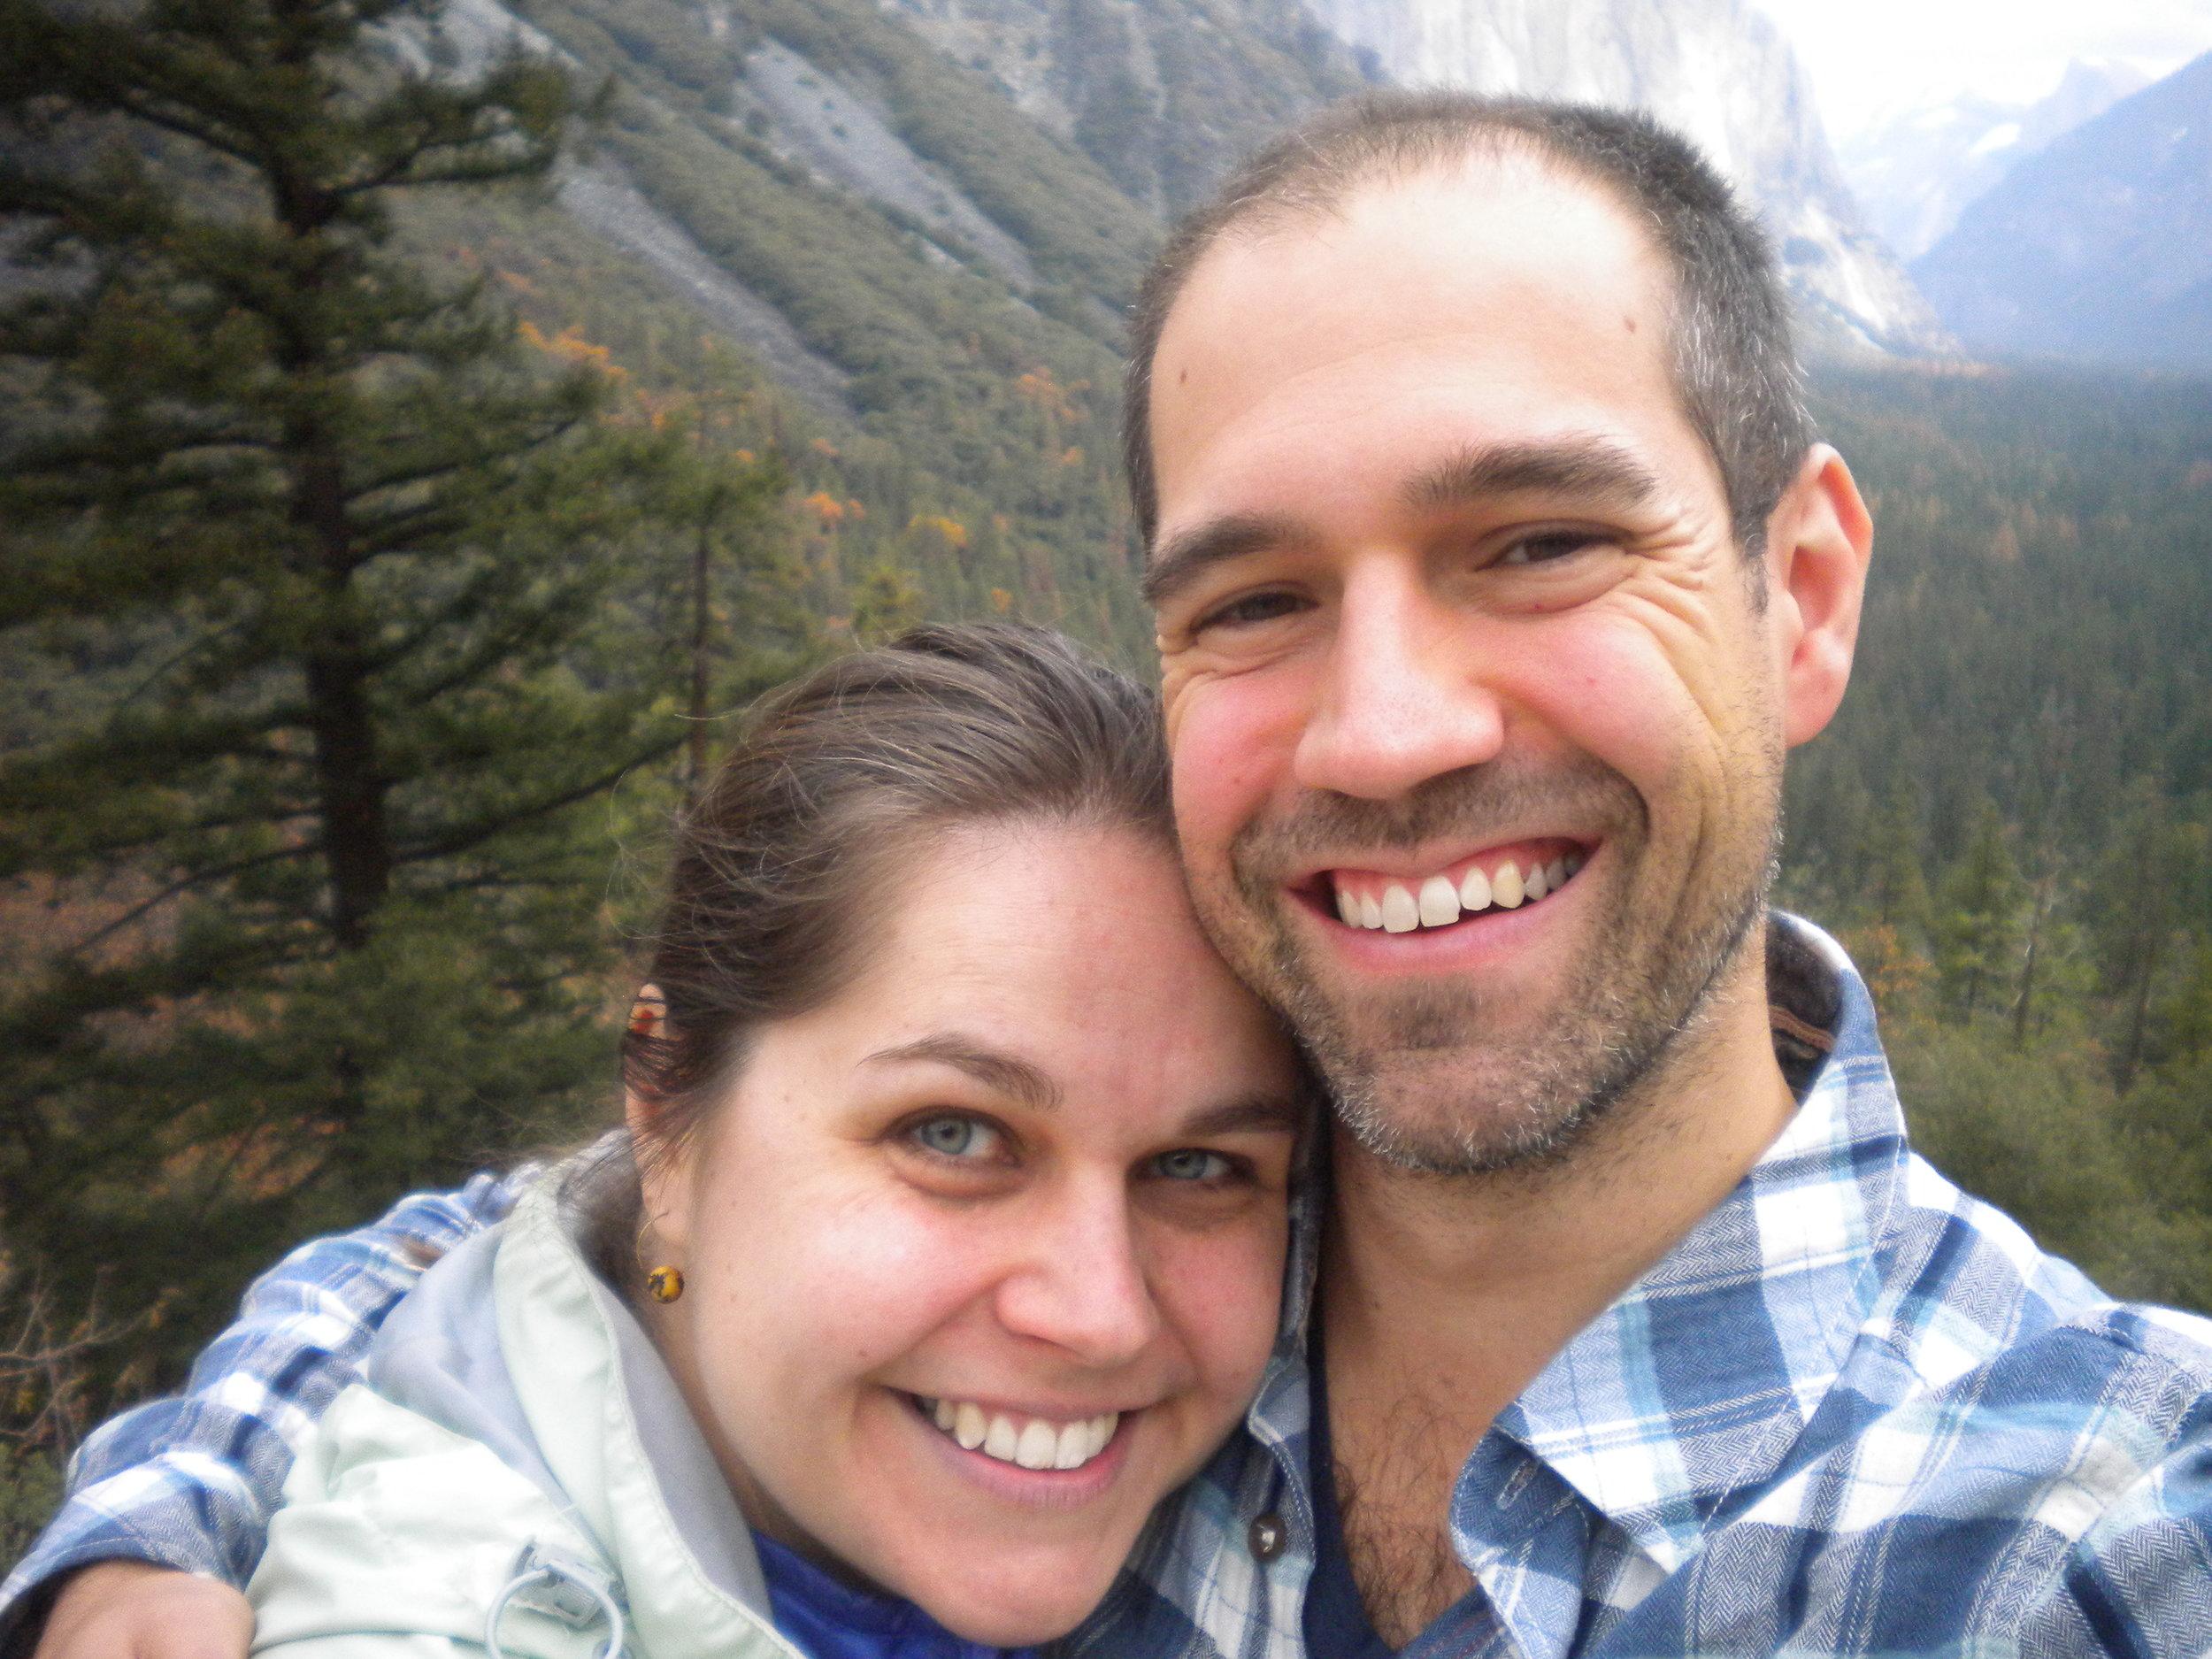 WJ_Yosemite.JPG